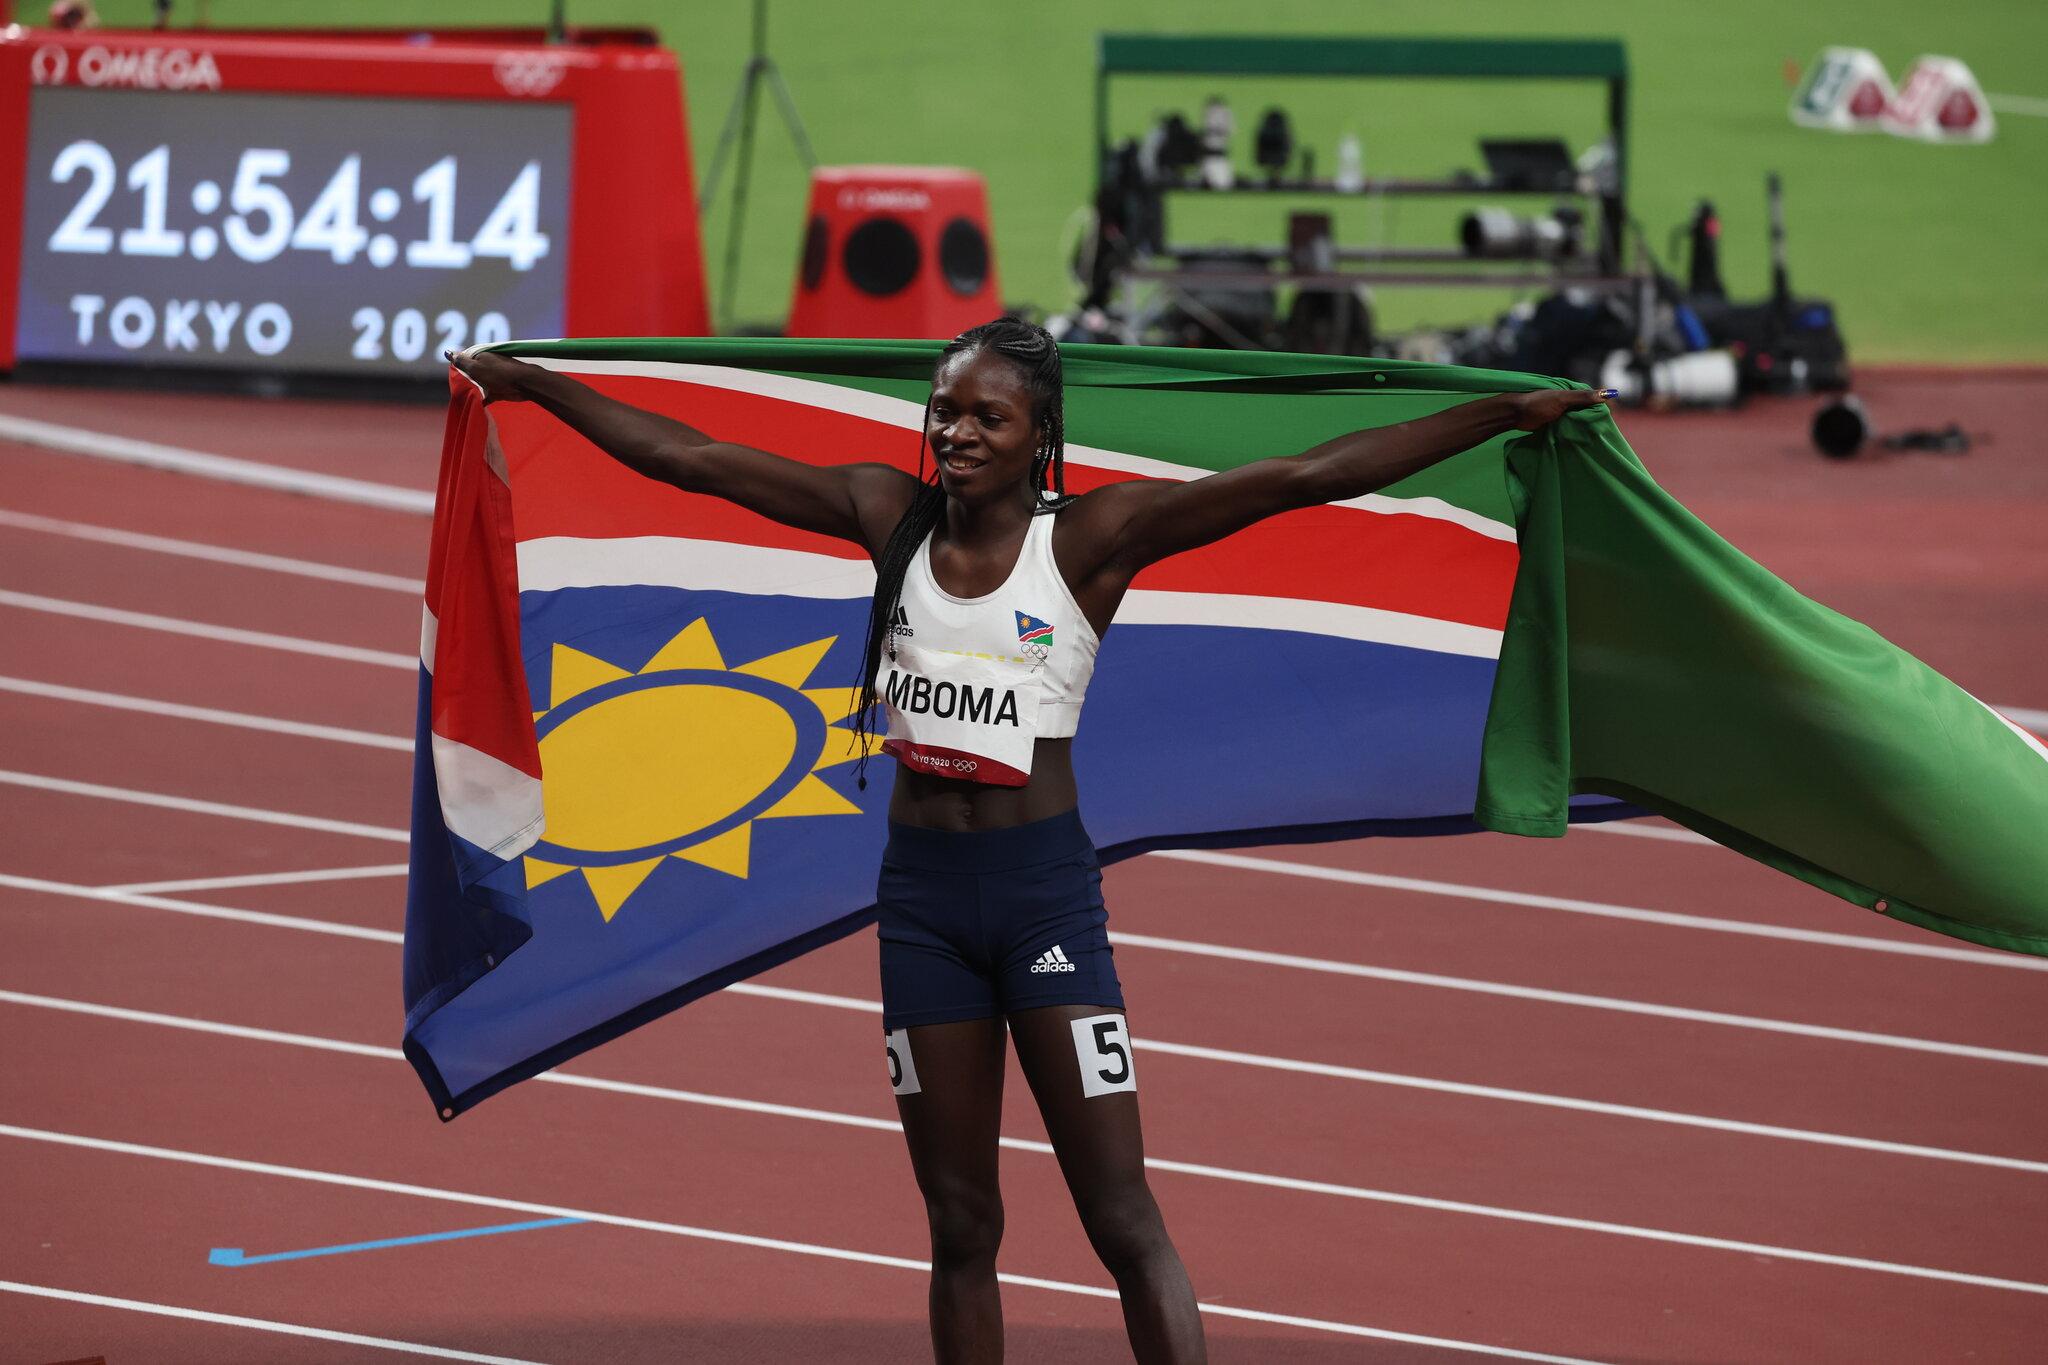 Namibia's Mboma creates history by winning silver at Olympics